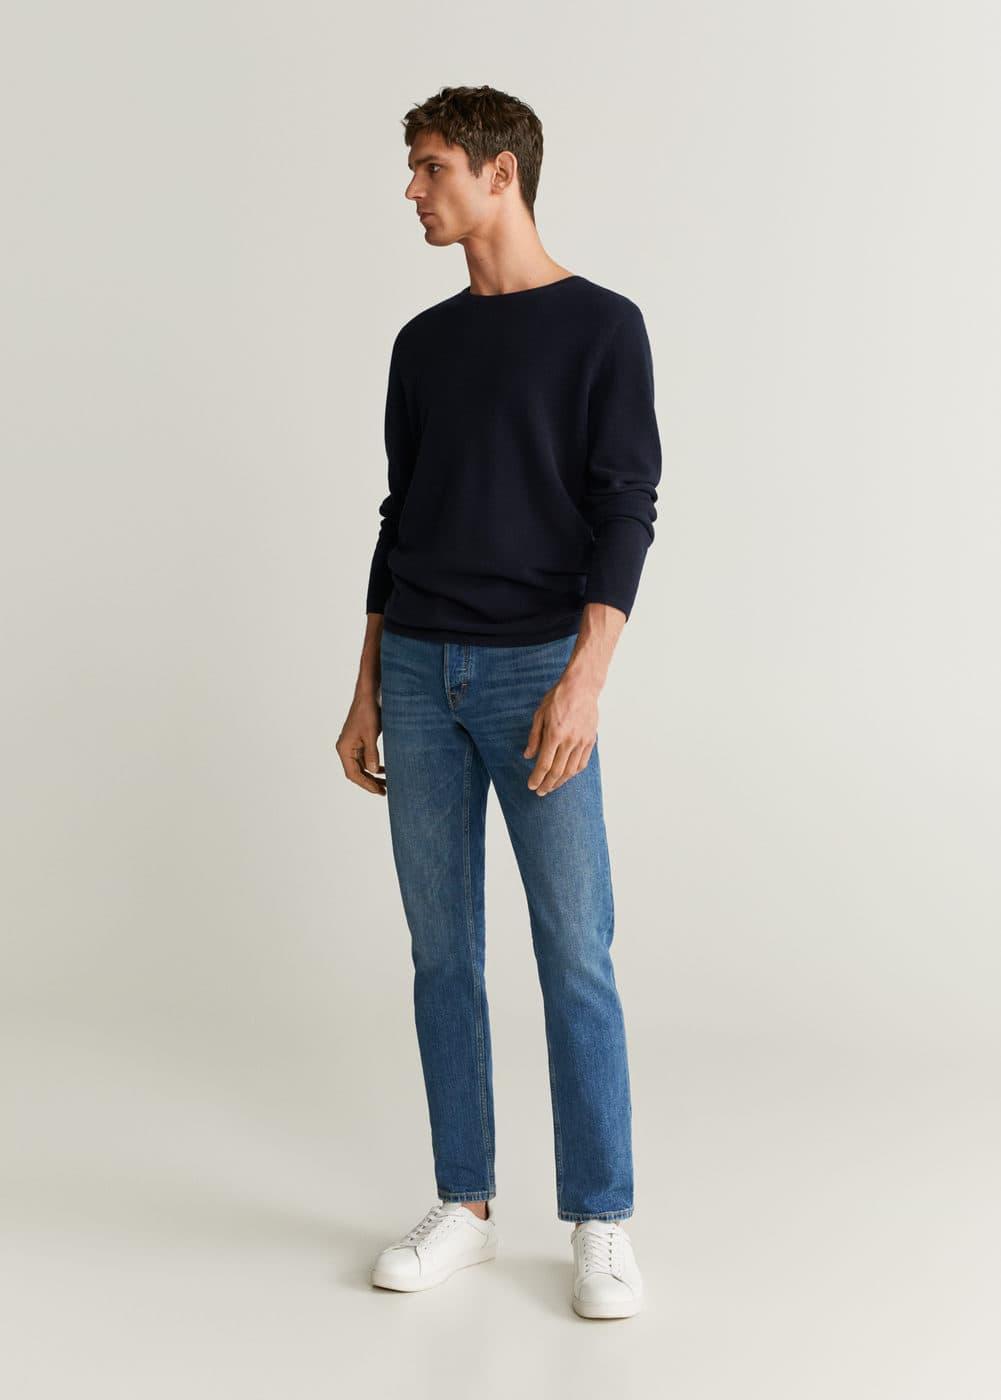 h-tim5:jeans tim slim fit lavado medio